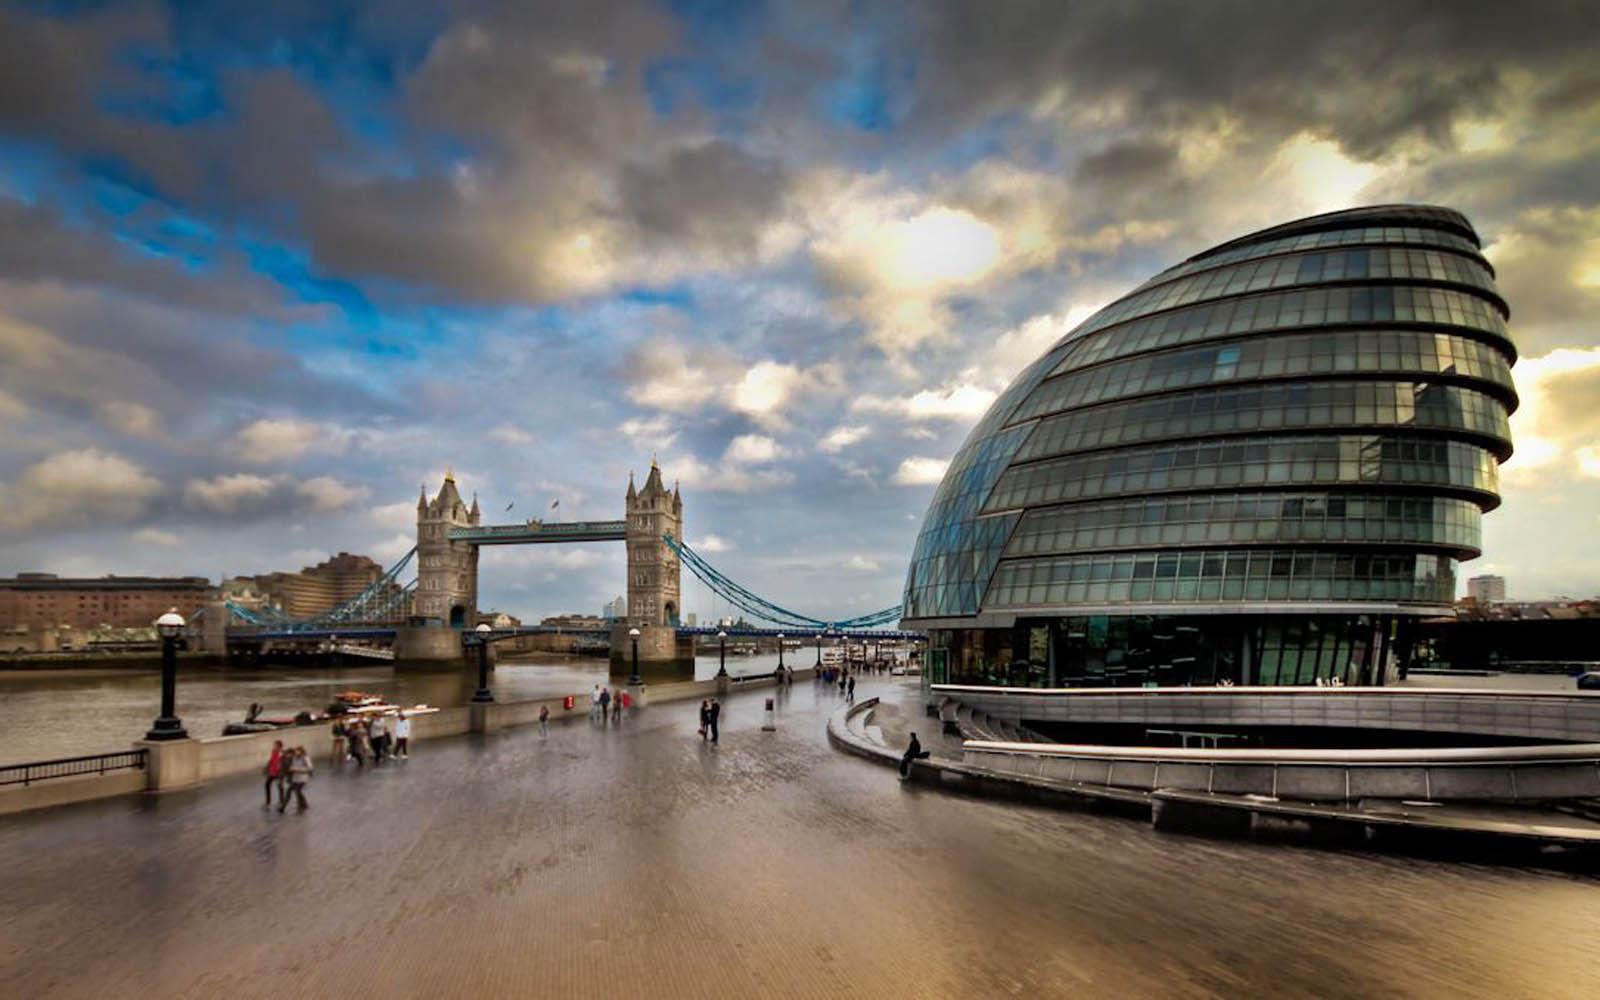 london city wallpapers - photo #12